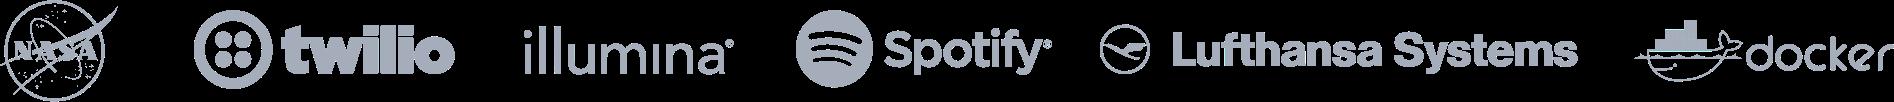 Customer logo set of NASA, twilio, illumina, lufthansa, spotify and docker